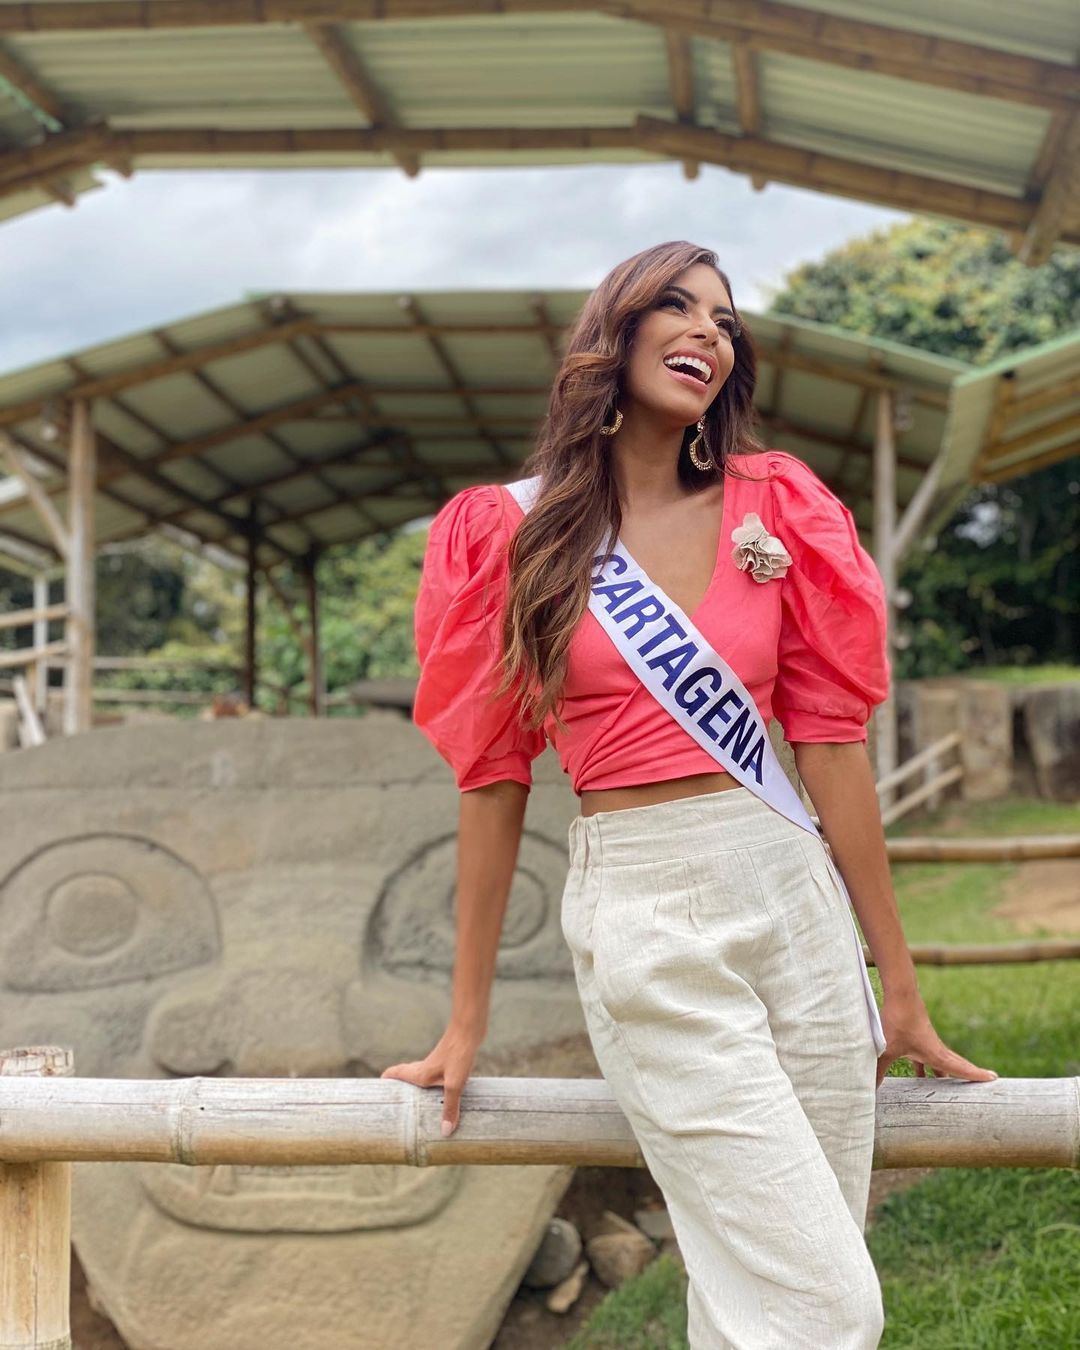 valeria ayos bossa, miss universe colombia 2021/miss water earth 2018. - Página 22 24146312